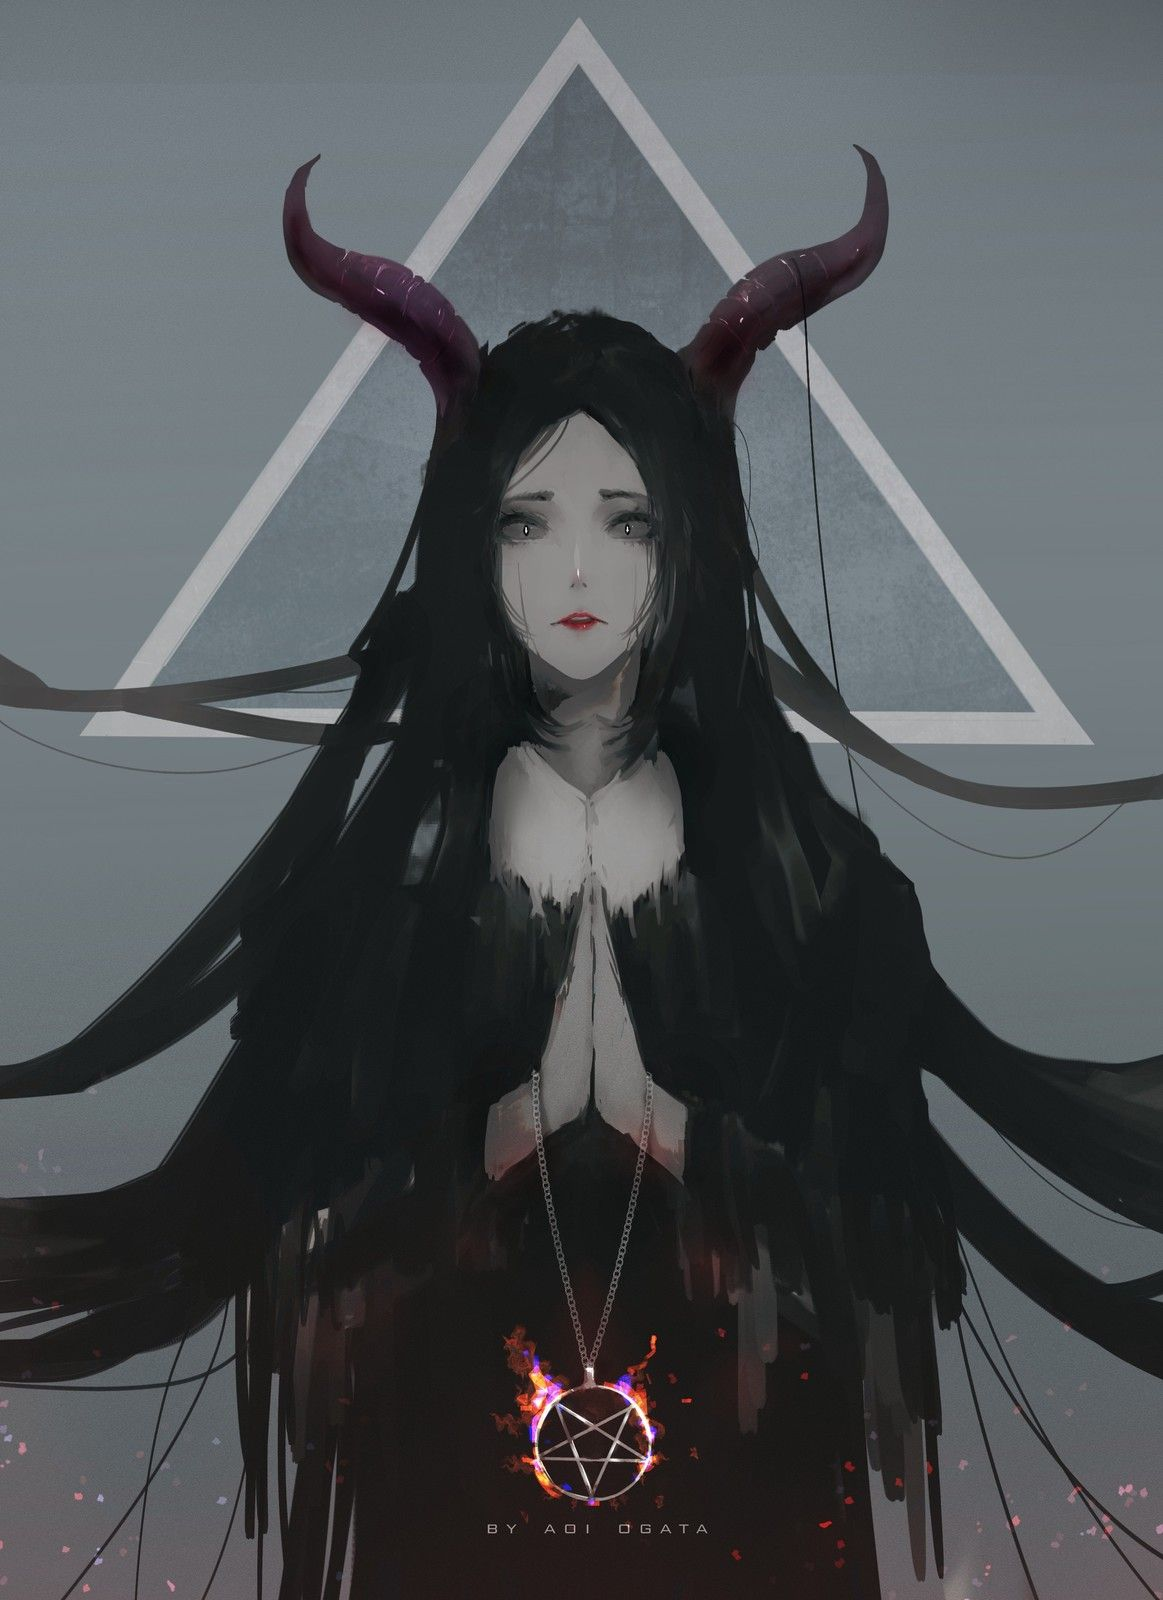 Pin by arsalan ahmad on fantasy anime art anime fantasy - Dark anime girl pics ...